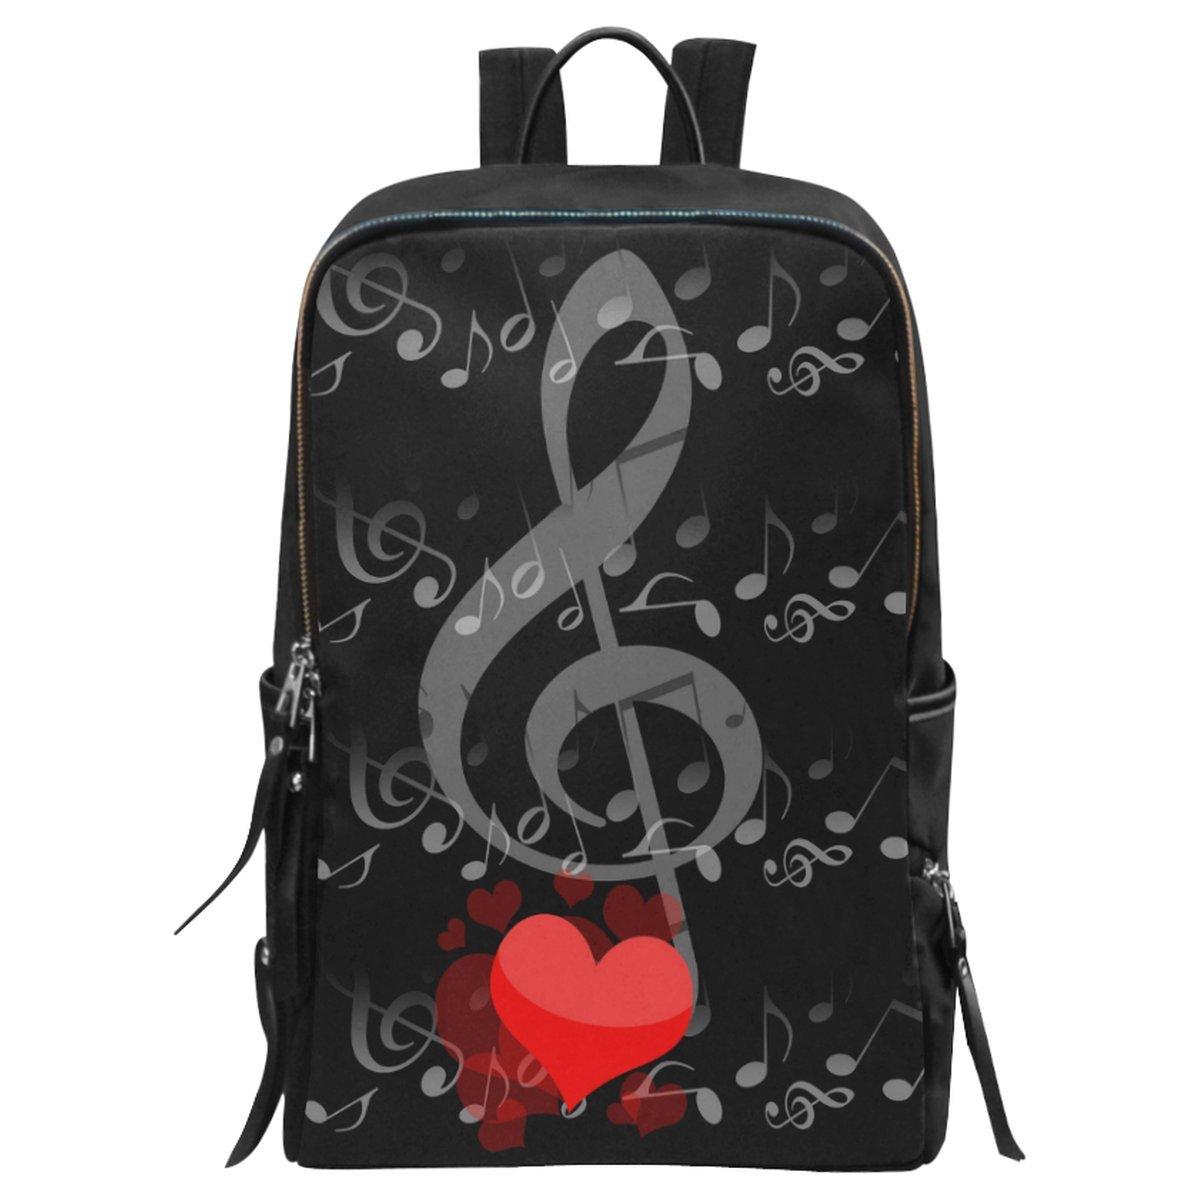 InterestPrint Music Notes Love School Casual Travel Backpack School Bag Travel Daypack by InterestPrint (Image #1)